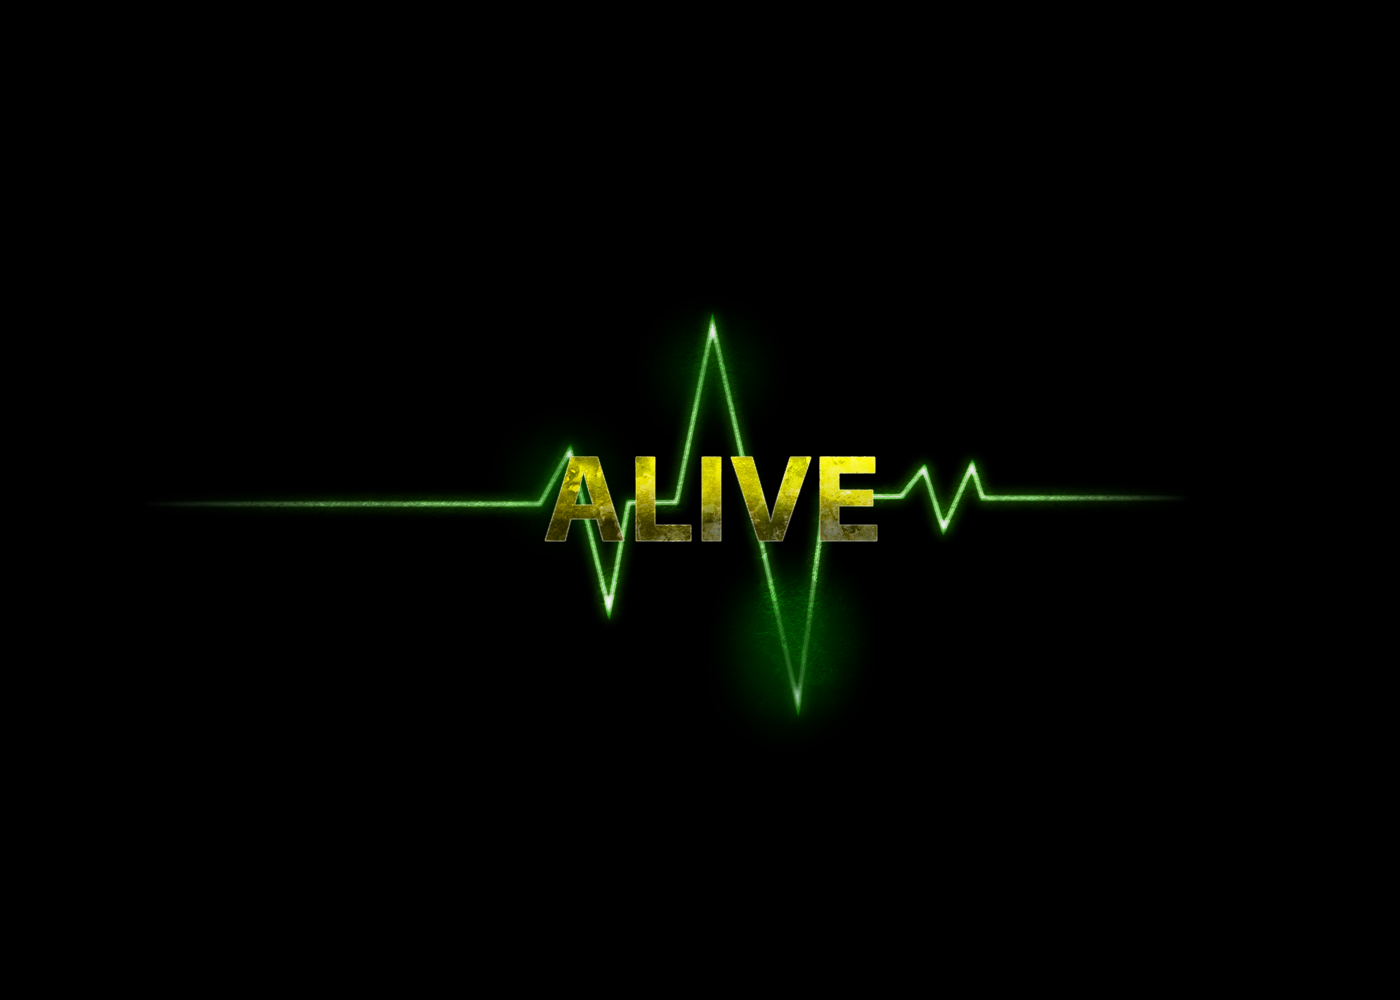 alive wallpaper 731583 alive wallpaper 731559 alive wallpaper 731568 1400x1000